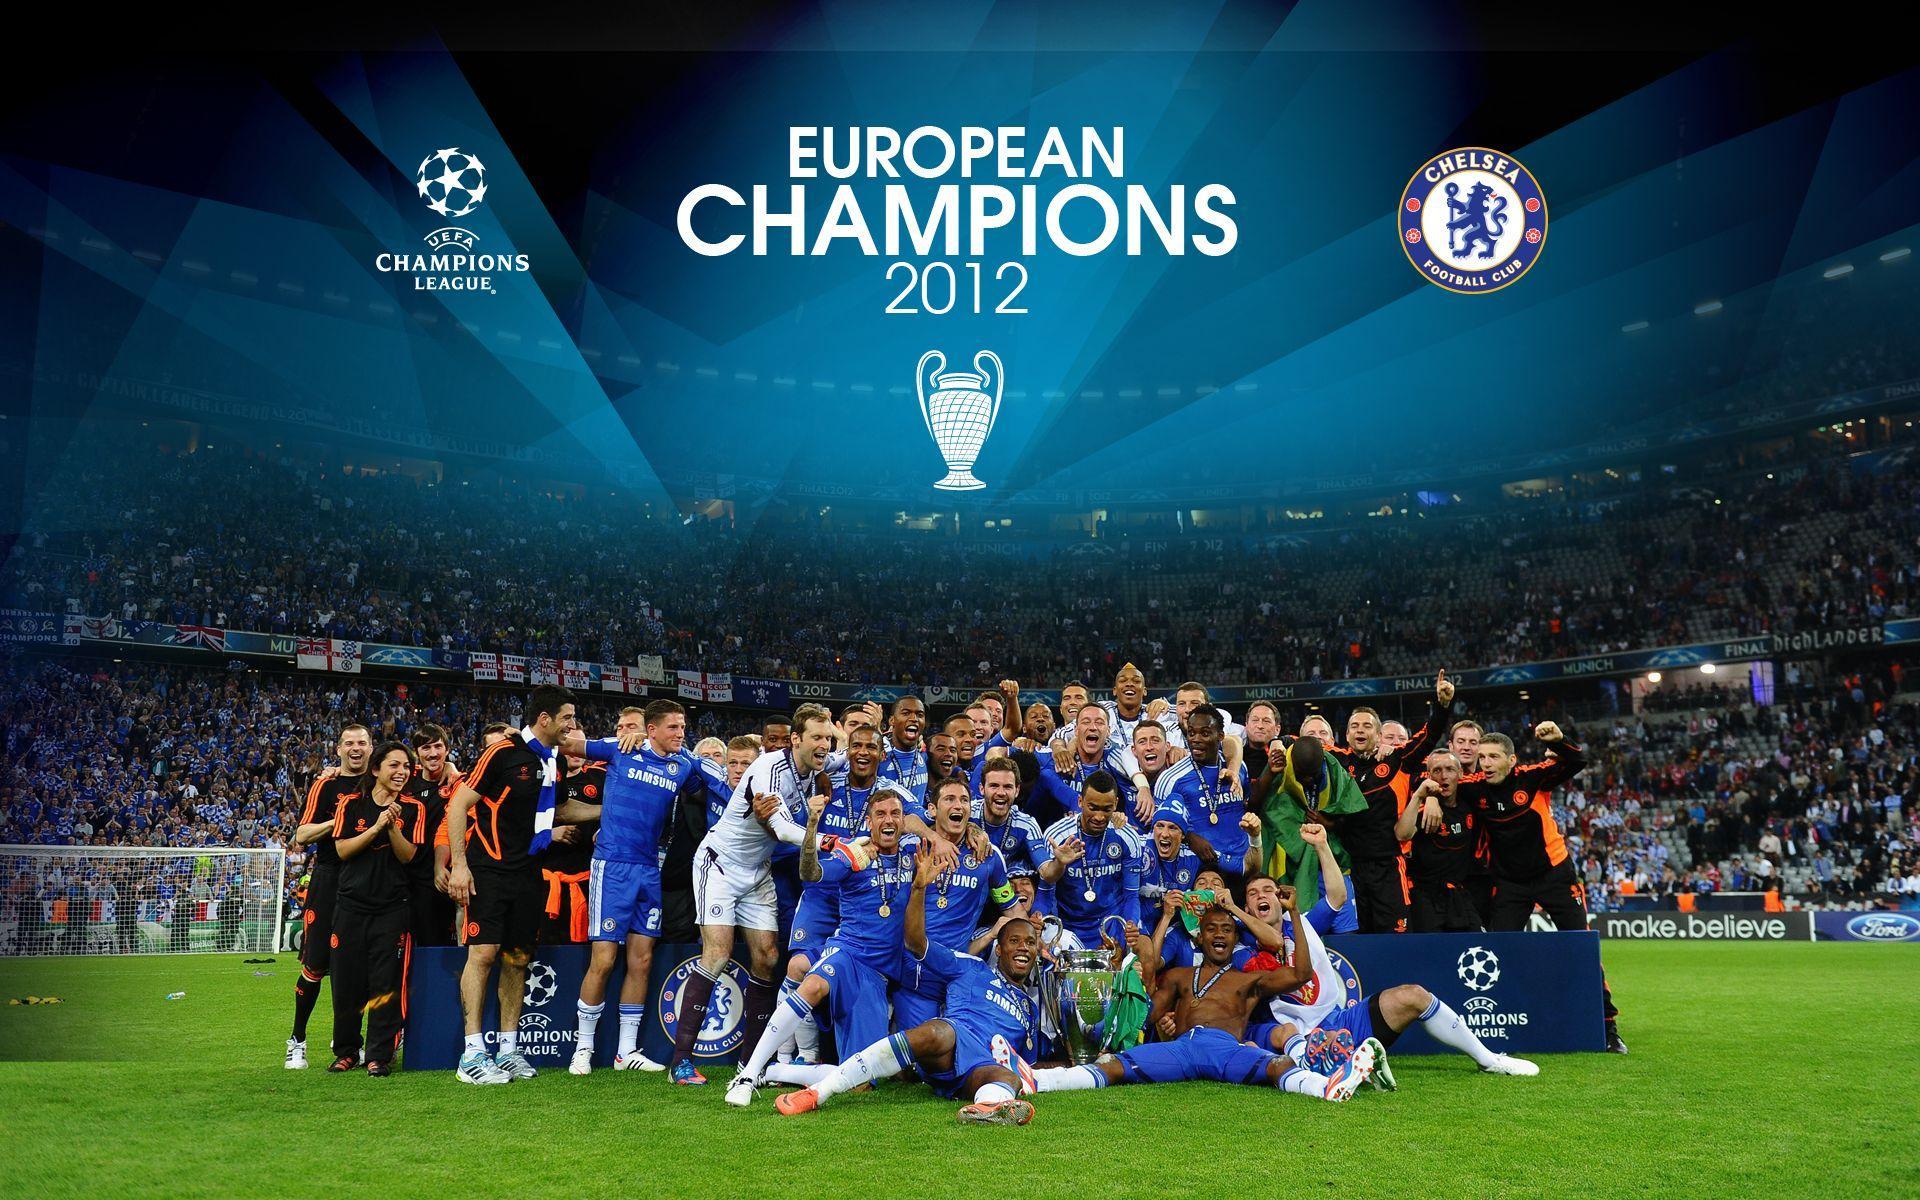 Chelsea Wallpapers Champions League - Wallpaper Cave